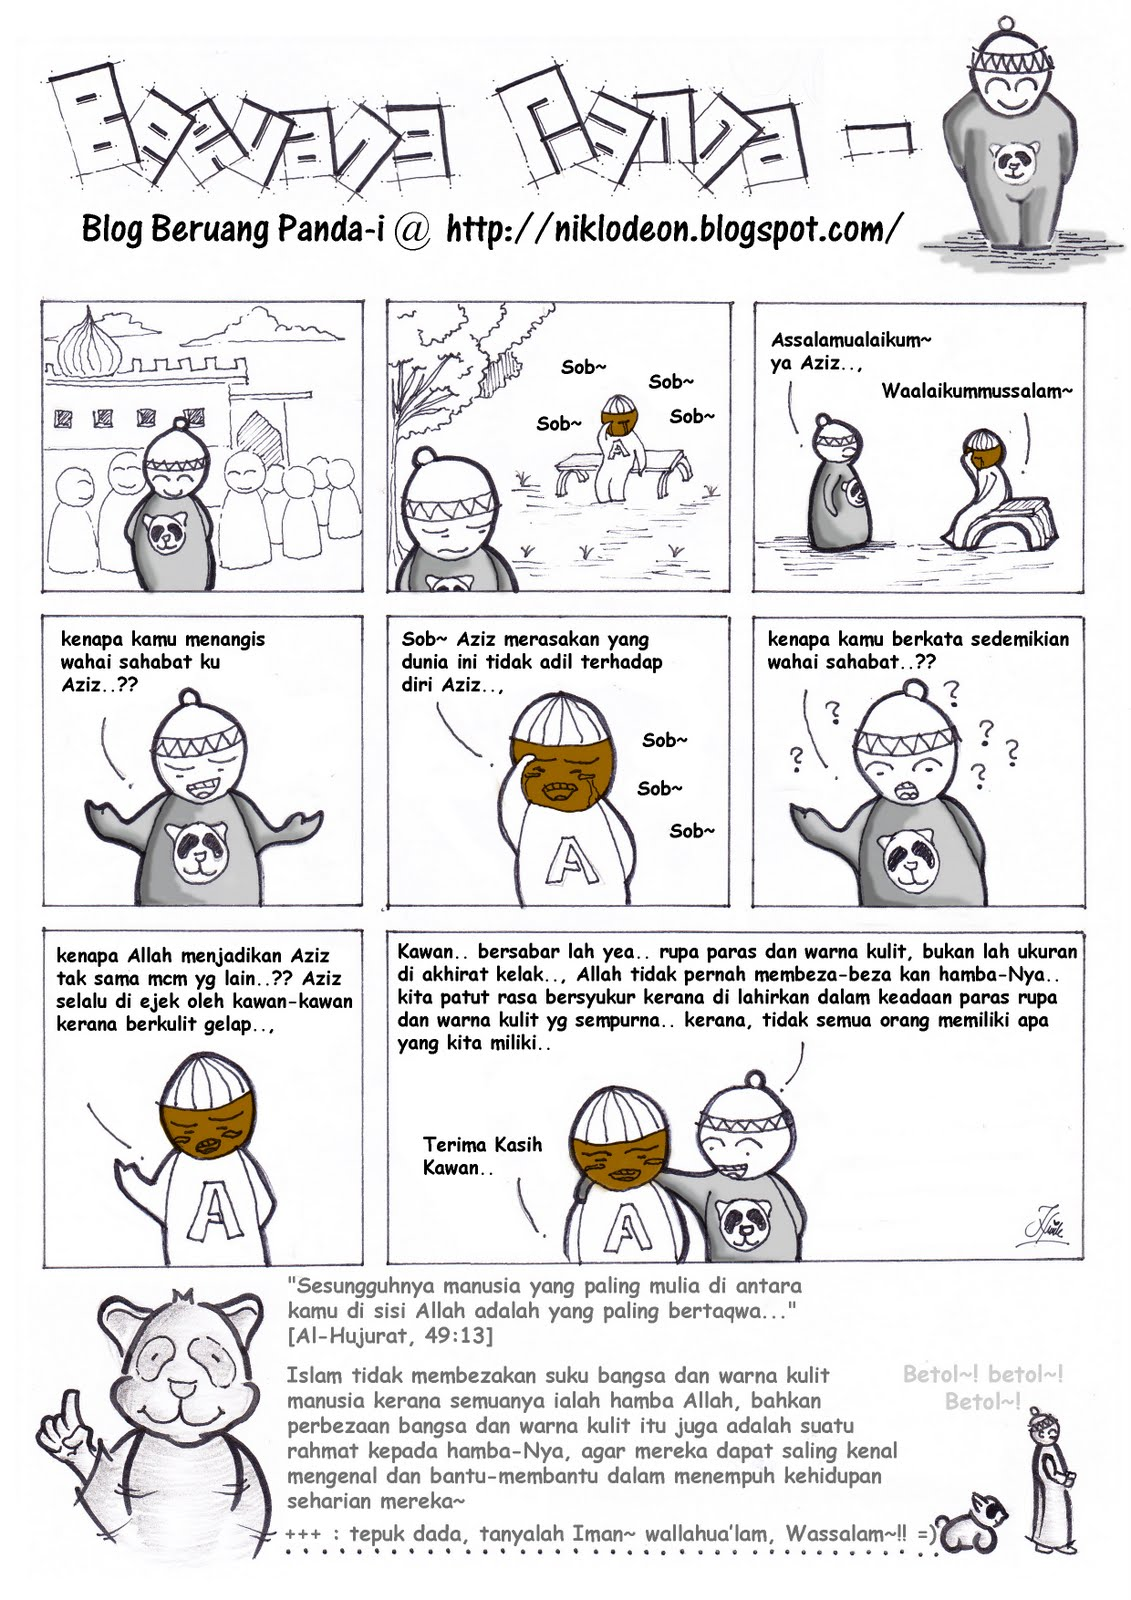 Ivanildosantos Gambar Panda